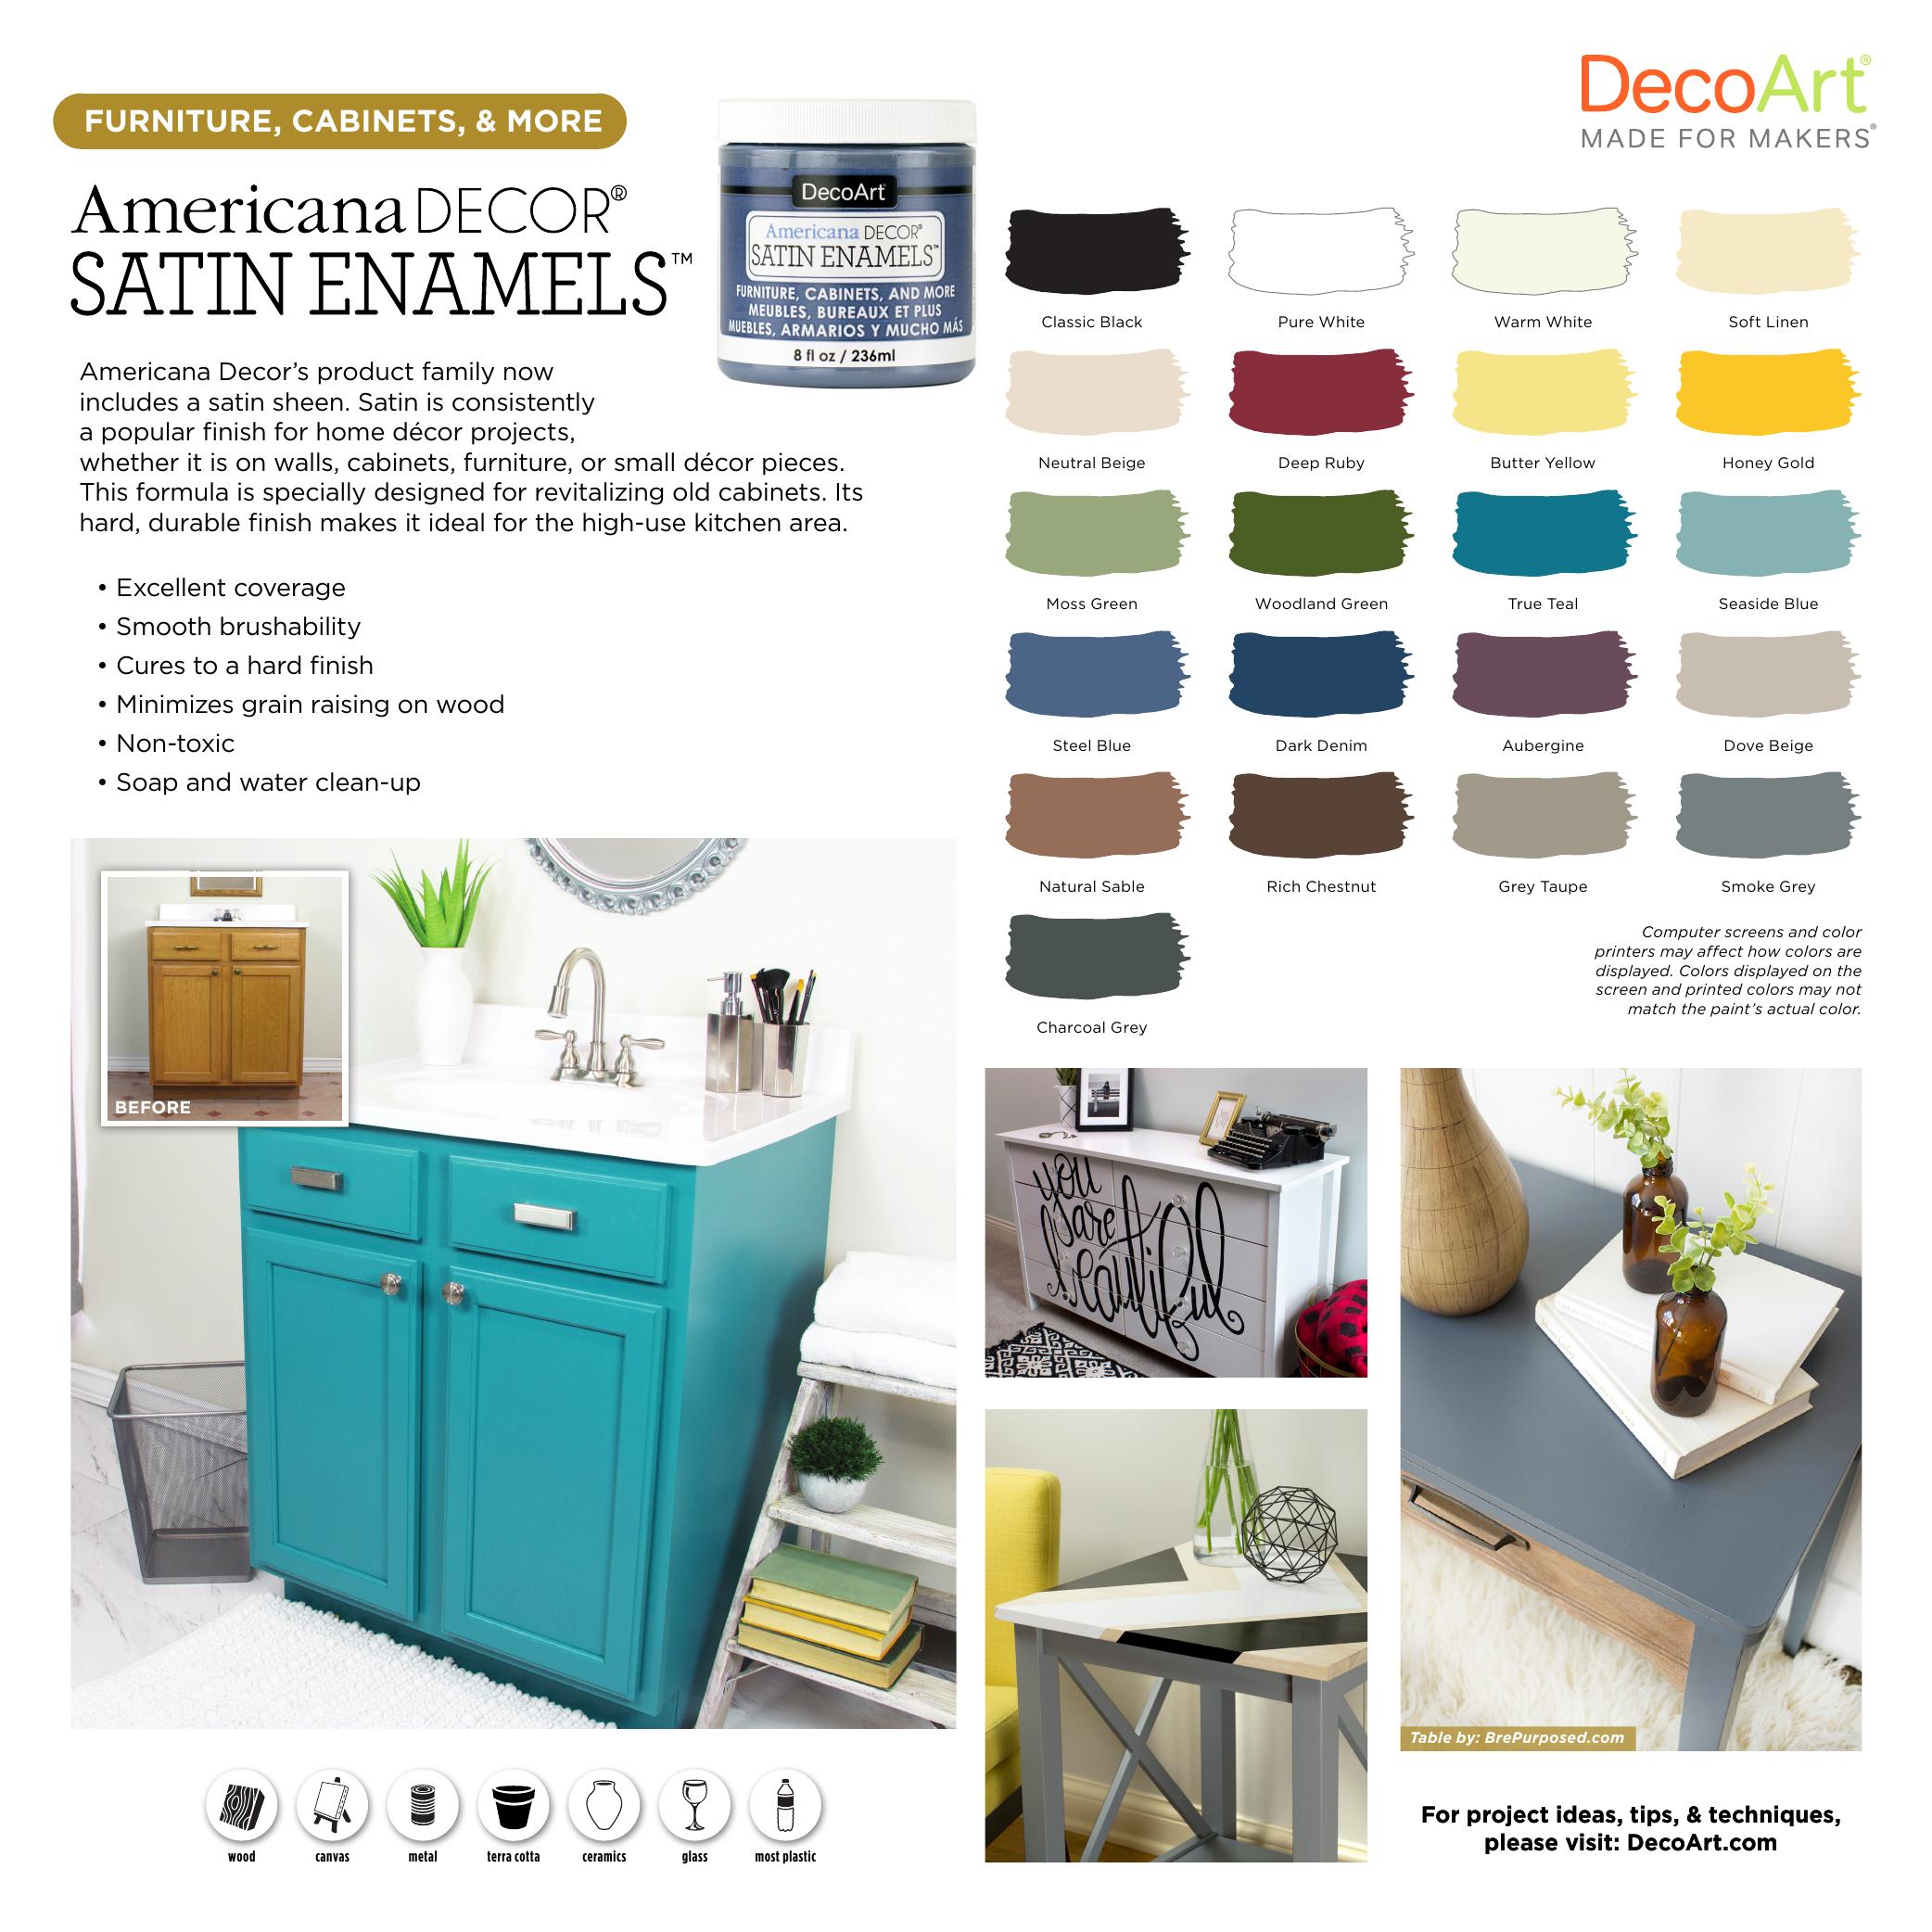 Americana Decor ADSA9 9 9 oz. Soft Linen Satin Enamel Paint Use ...